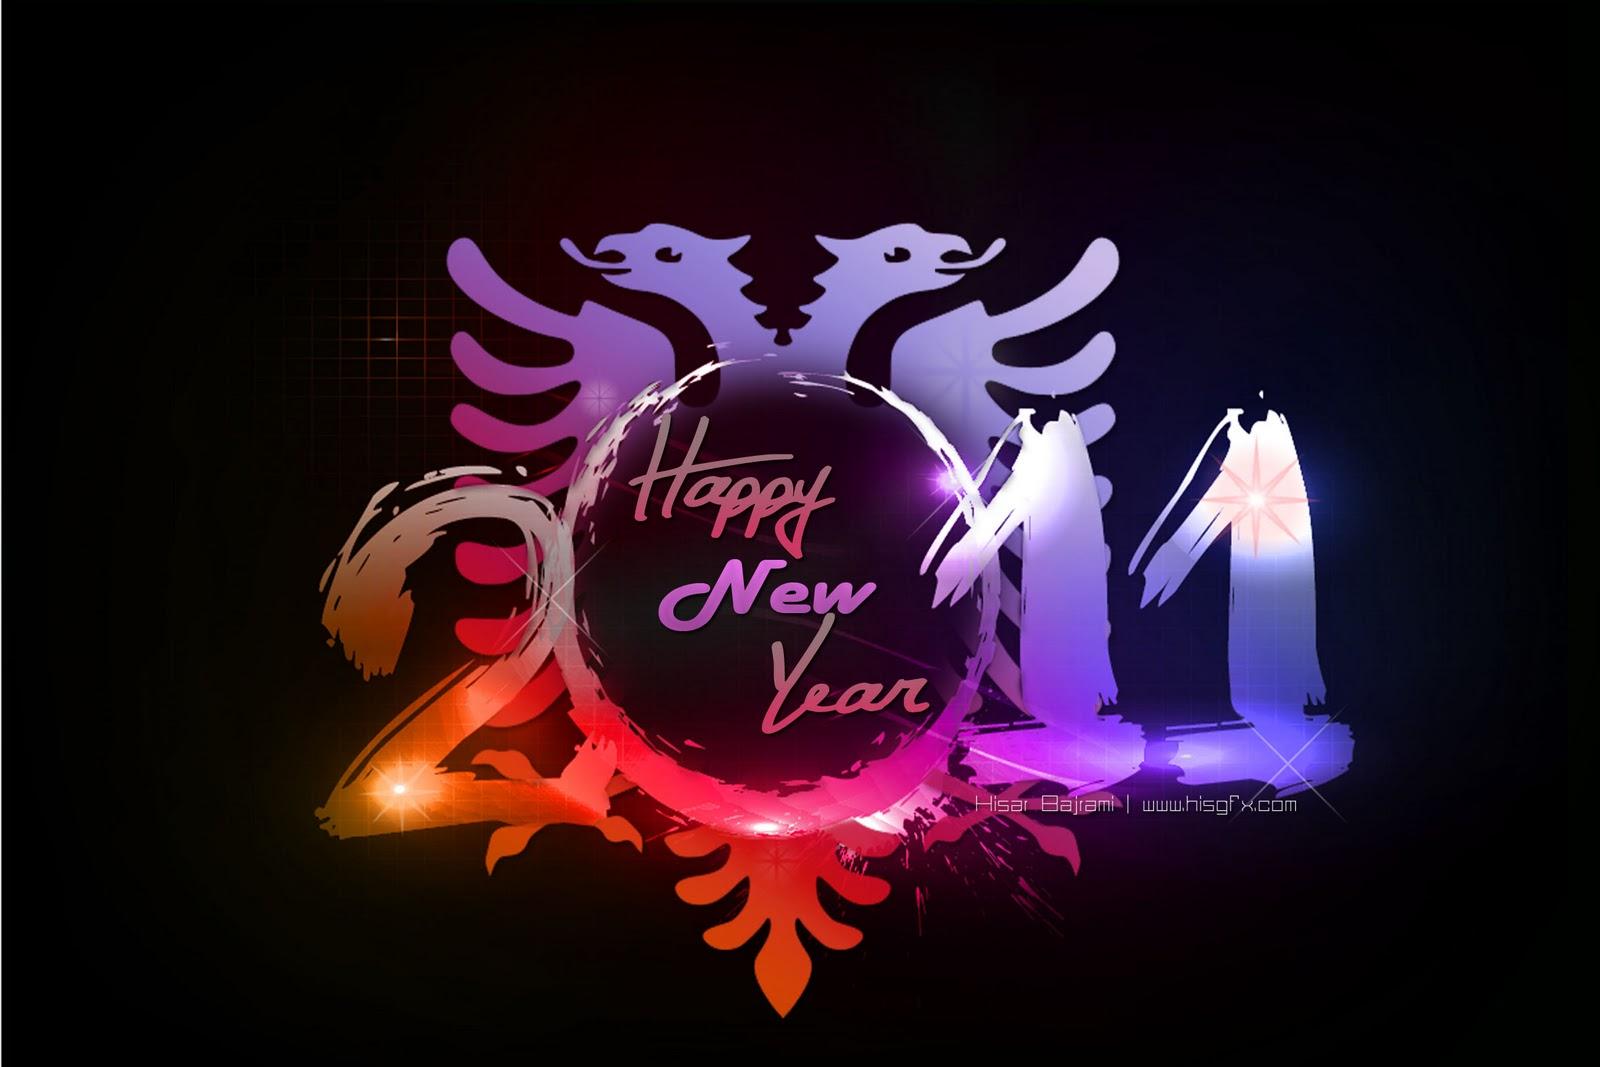 happy_new_year_2011_by_tetova21-d35ittn